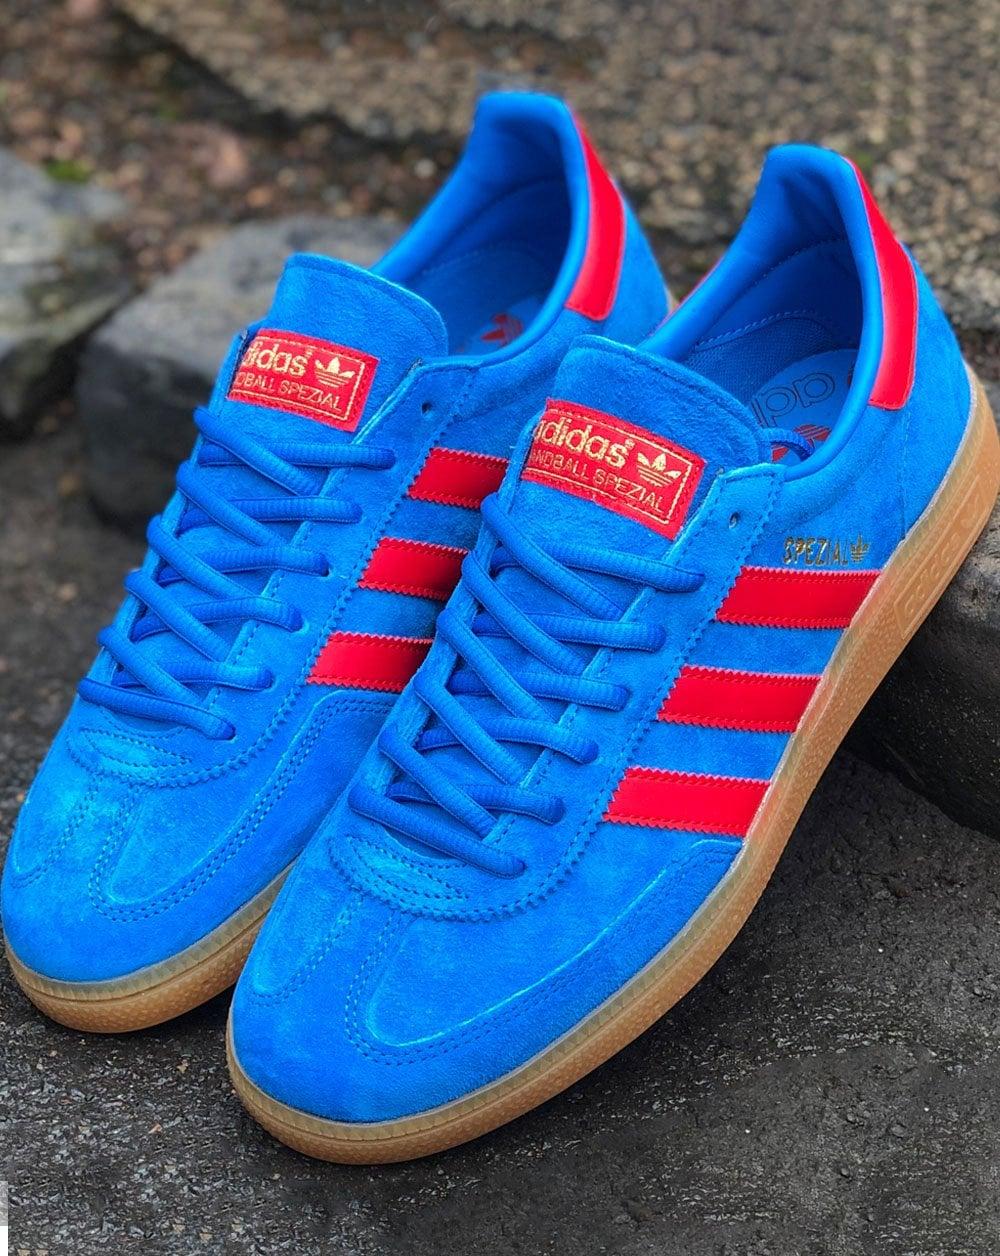 Adidas Spezial Trainers Bright Blue/Vivid Red